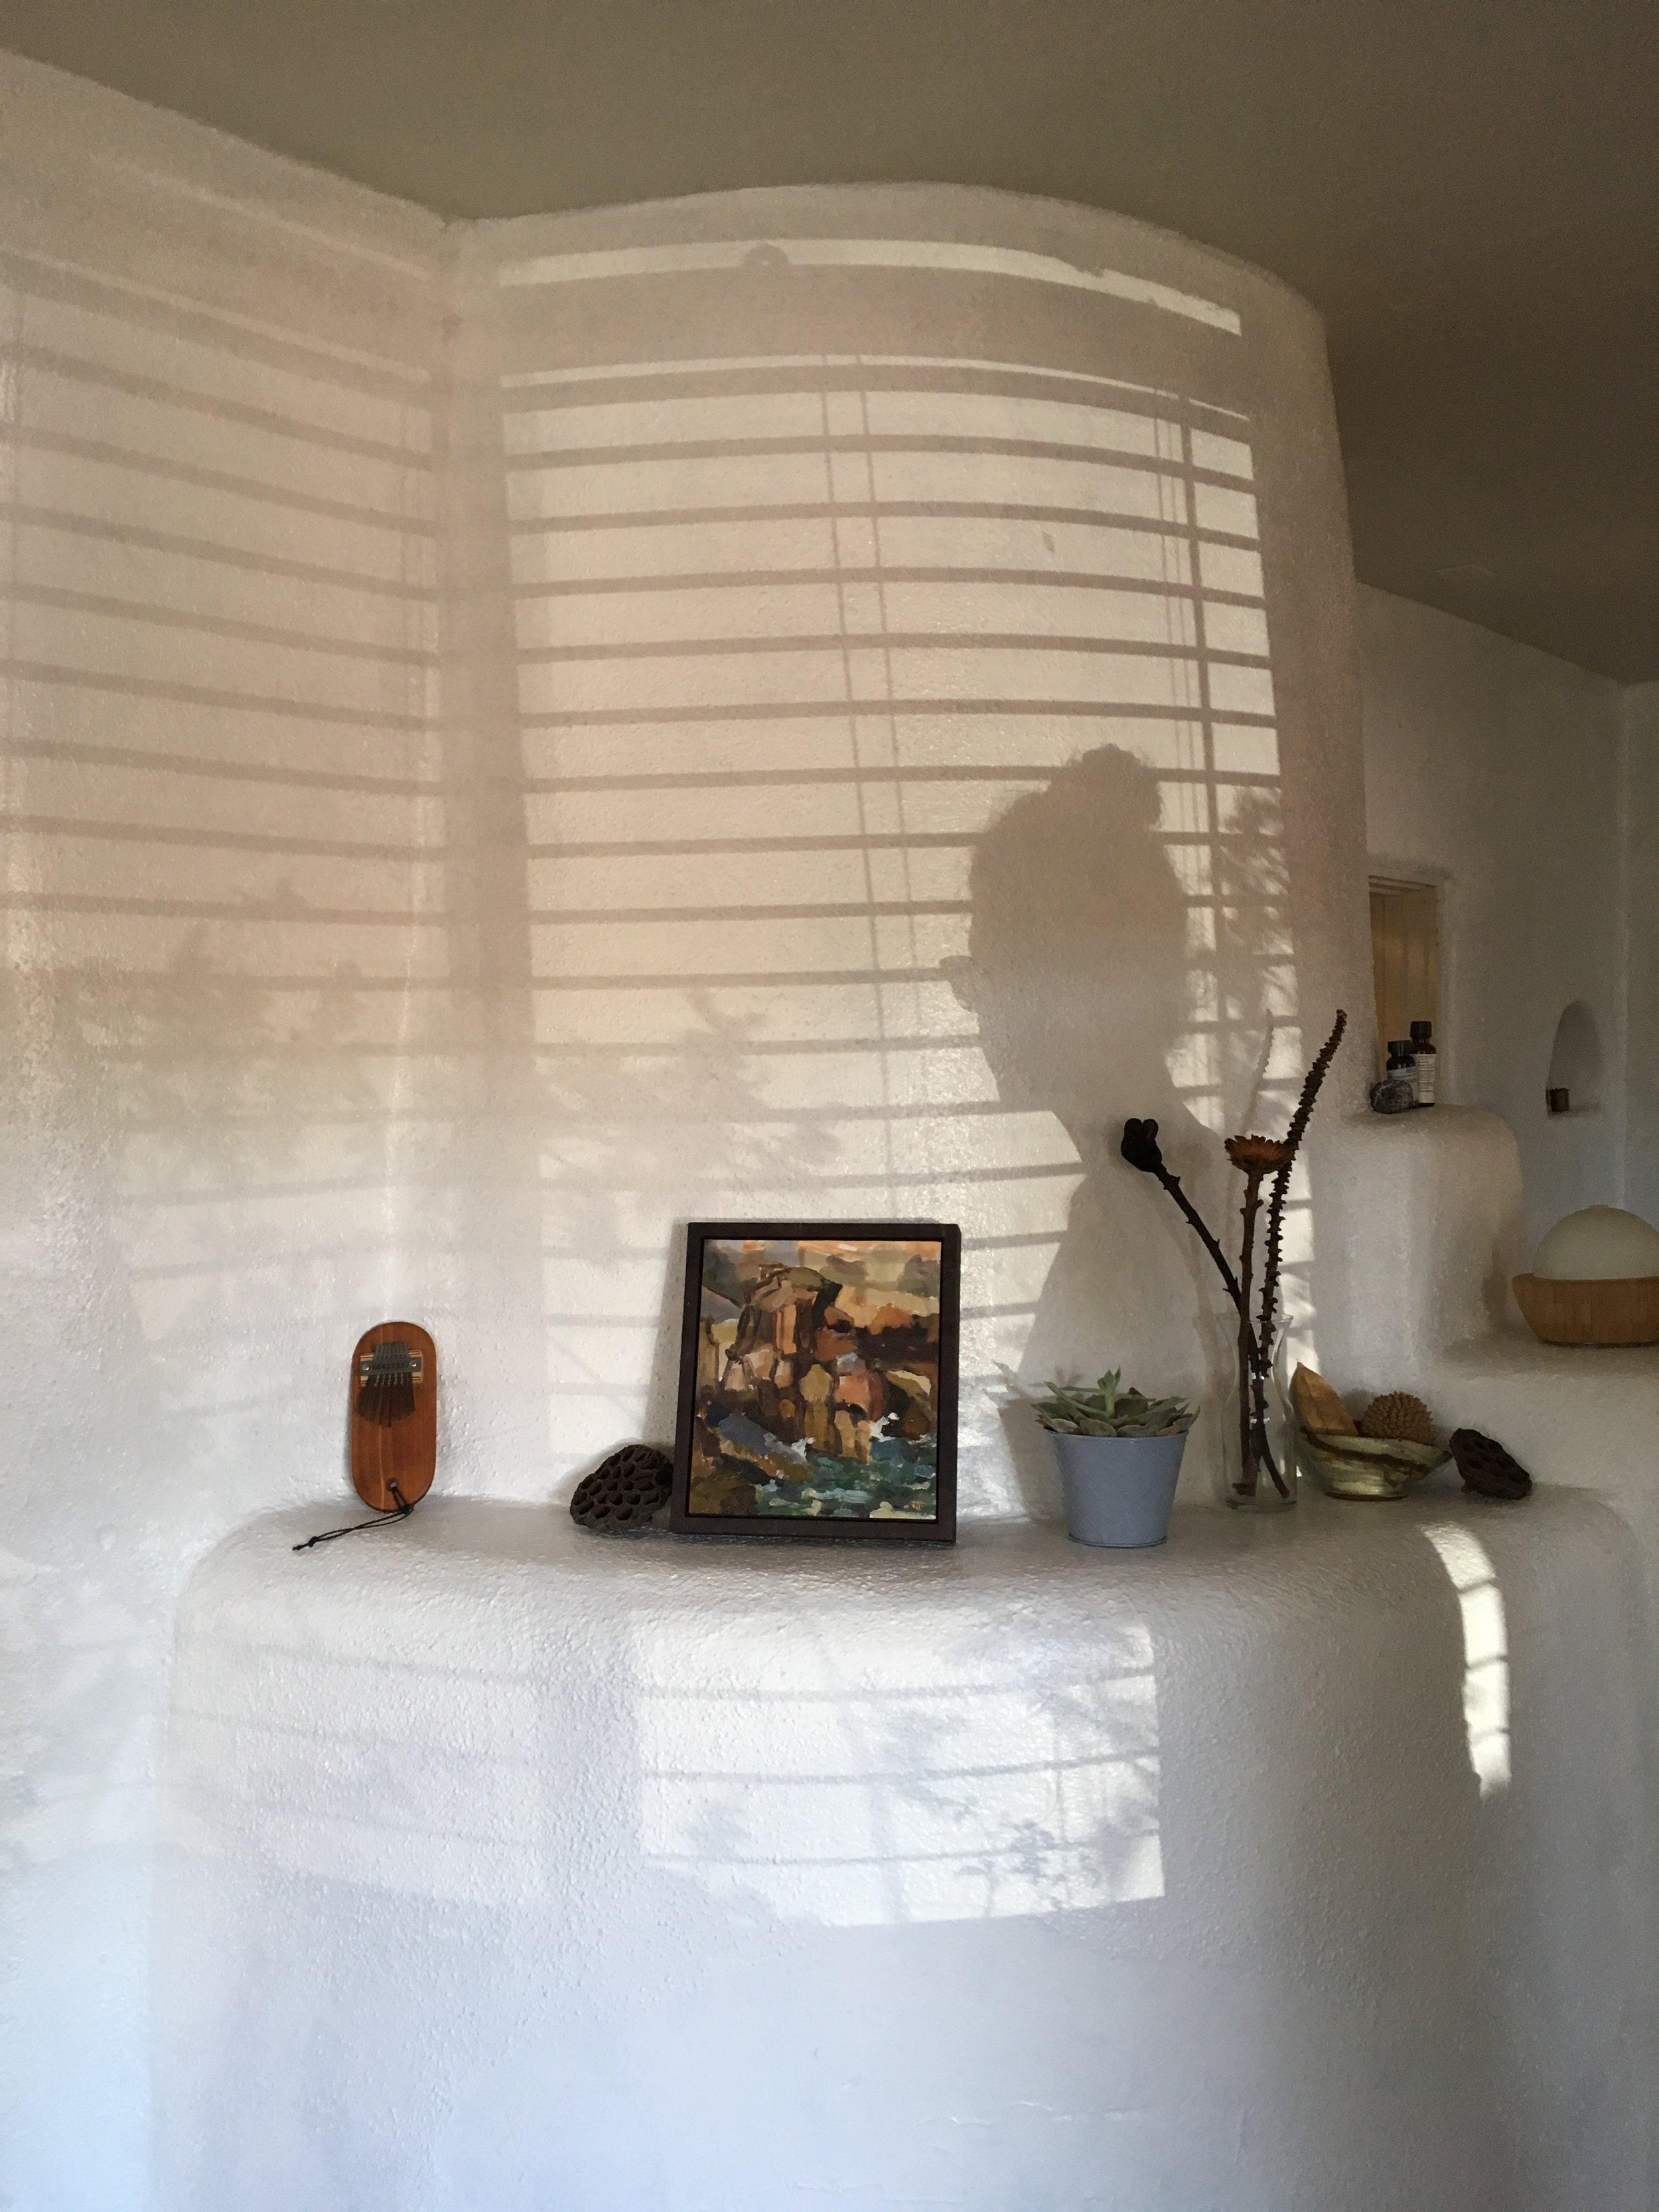 Santa Fe Style - Adobe Kiva Fireplace - Rebecca Mir Grady